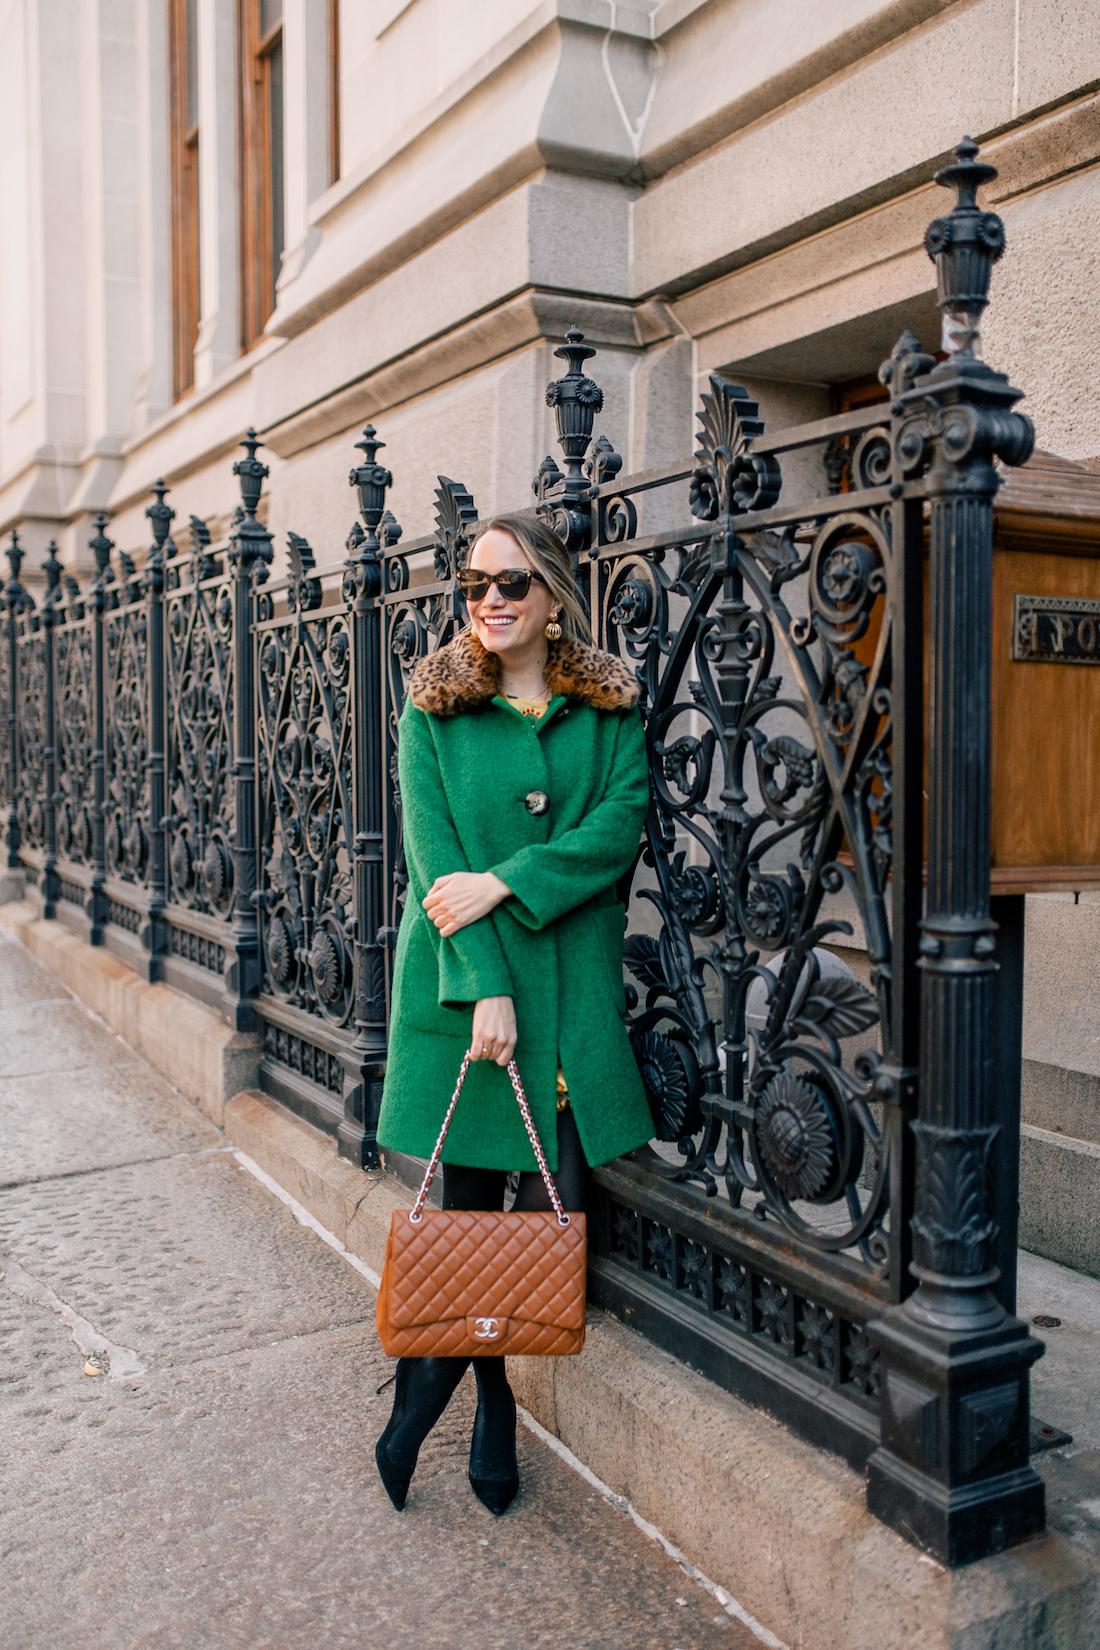 Grace Atwood's Outfit Details: L.K. Bennett Coat // Express Tights // Manolo Blahnik Pumps // Chanel Purse // Polaroid Sunglasses // Tuckernuck Earrings